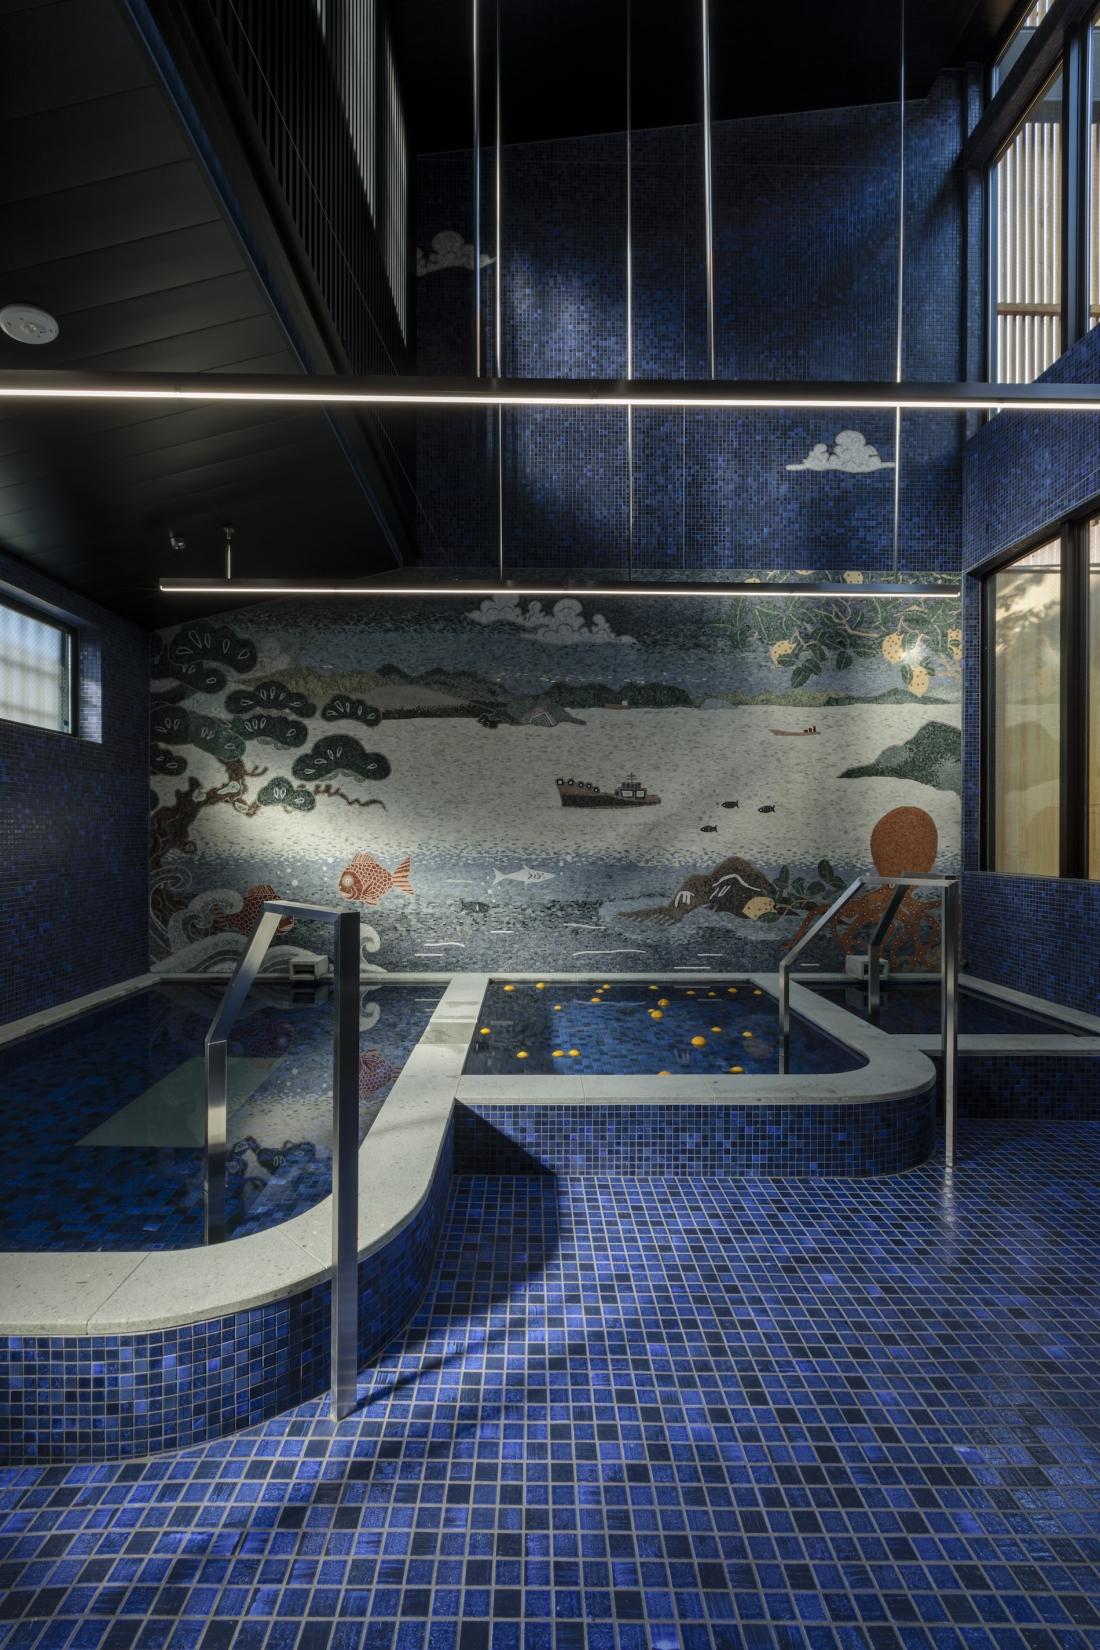 Yubune bathhouse entrance and communal bath © Tomohiro Sakashita